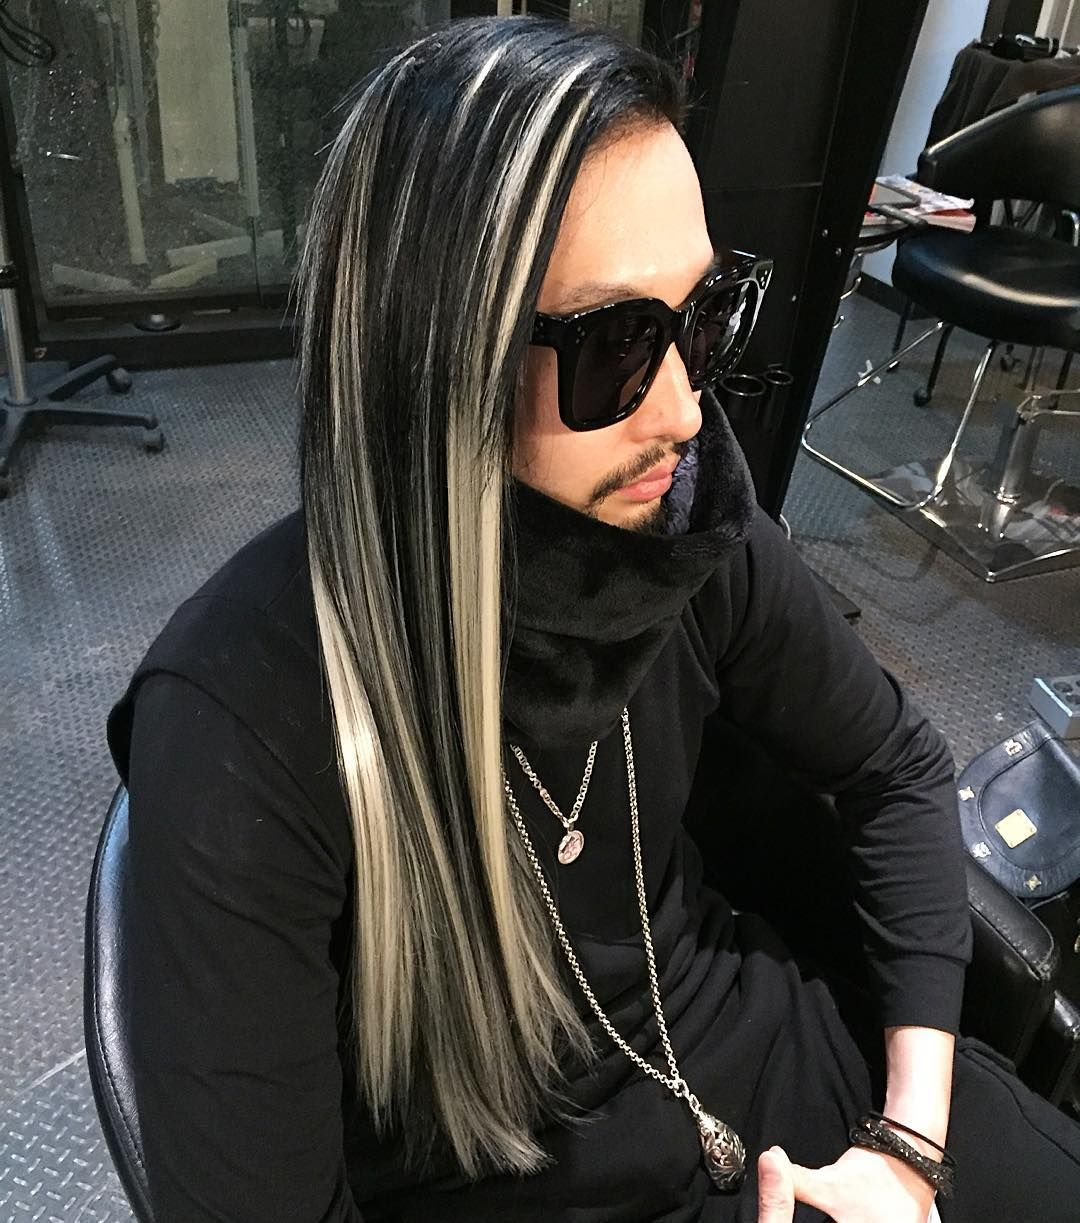 Maintaining @yusukenakaijapan 's white & black hairwith #hairextensions #individualextensions #hairbyChiyuki #extensions #whiteandblackhair #menslonghair #menshairstyles #guyswithcoolhair #coolhairstyles #hairdresser #lahairstylist by chiyukihair